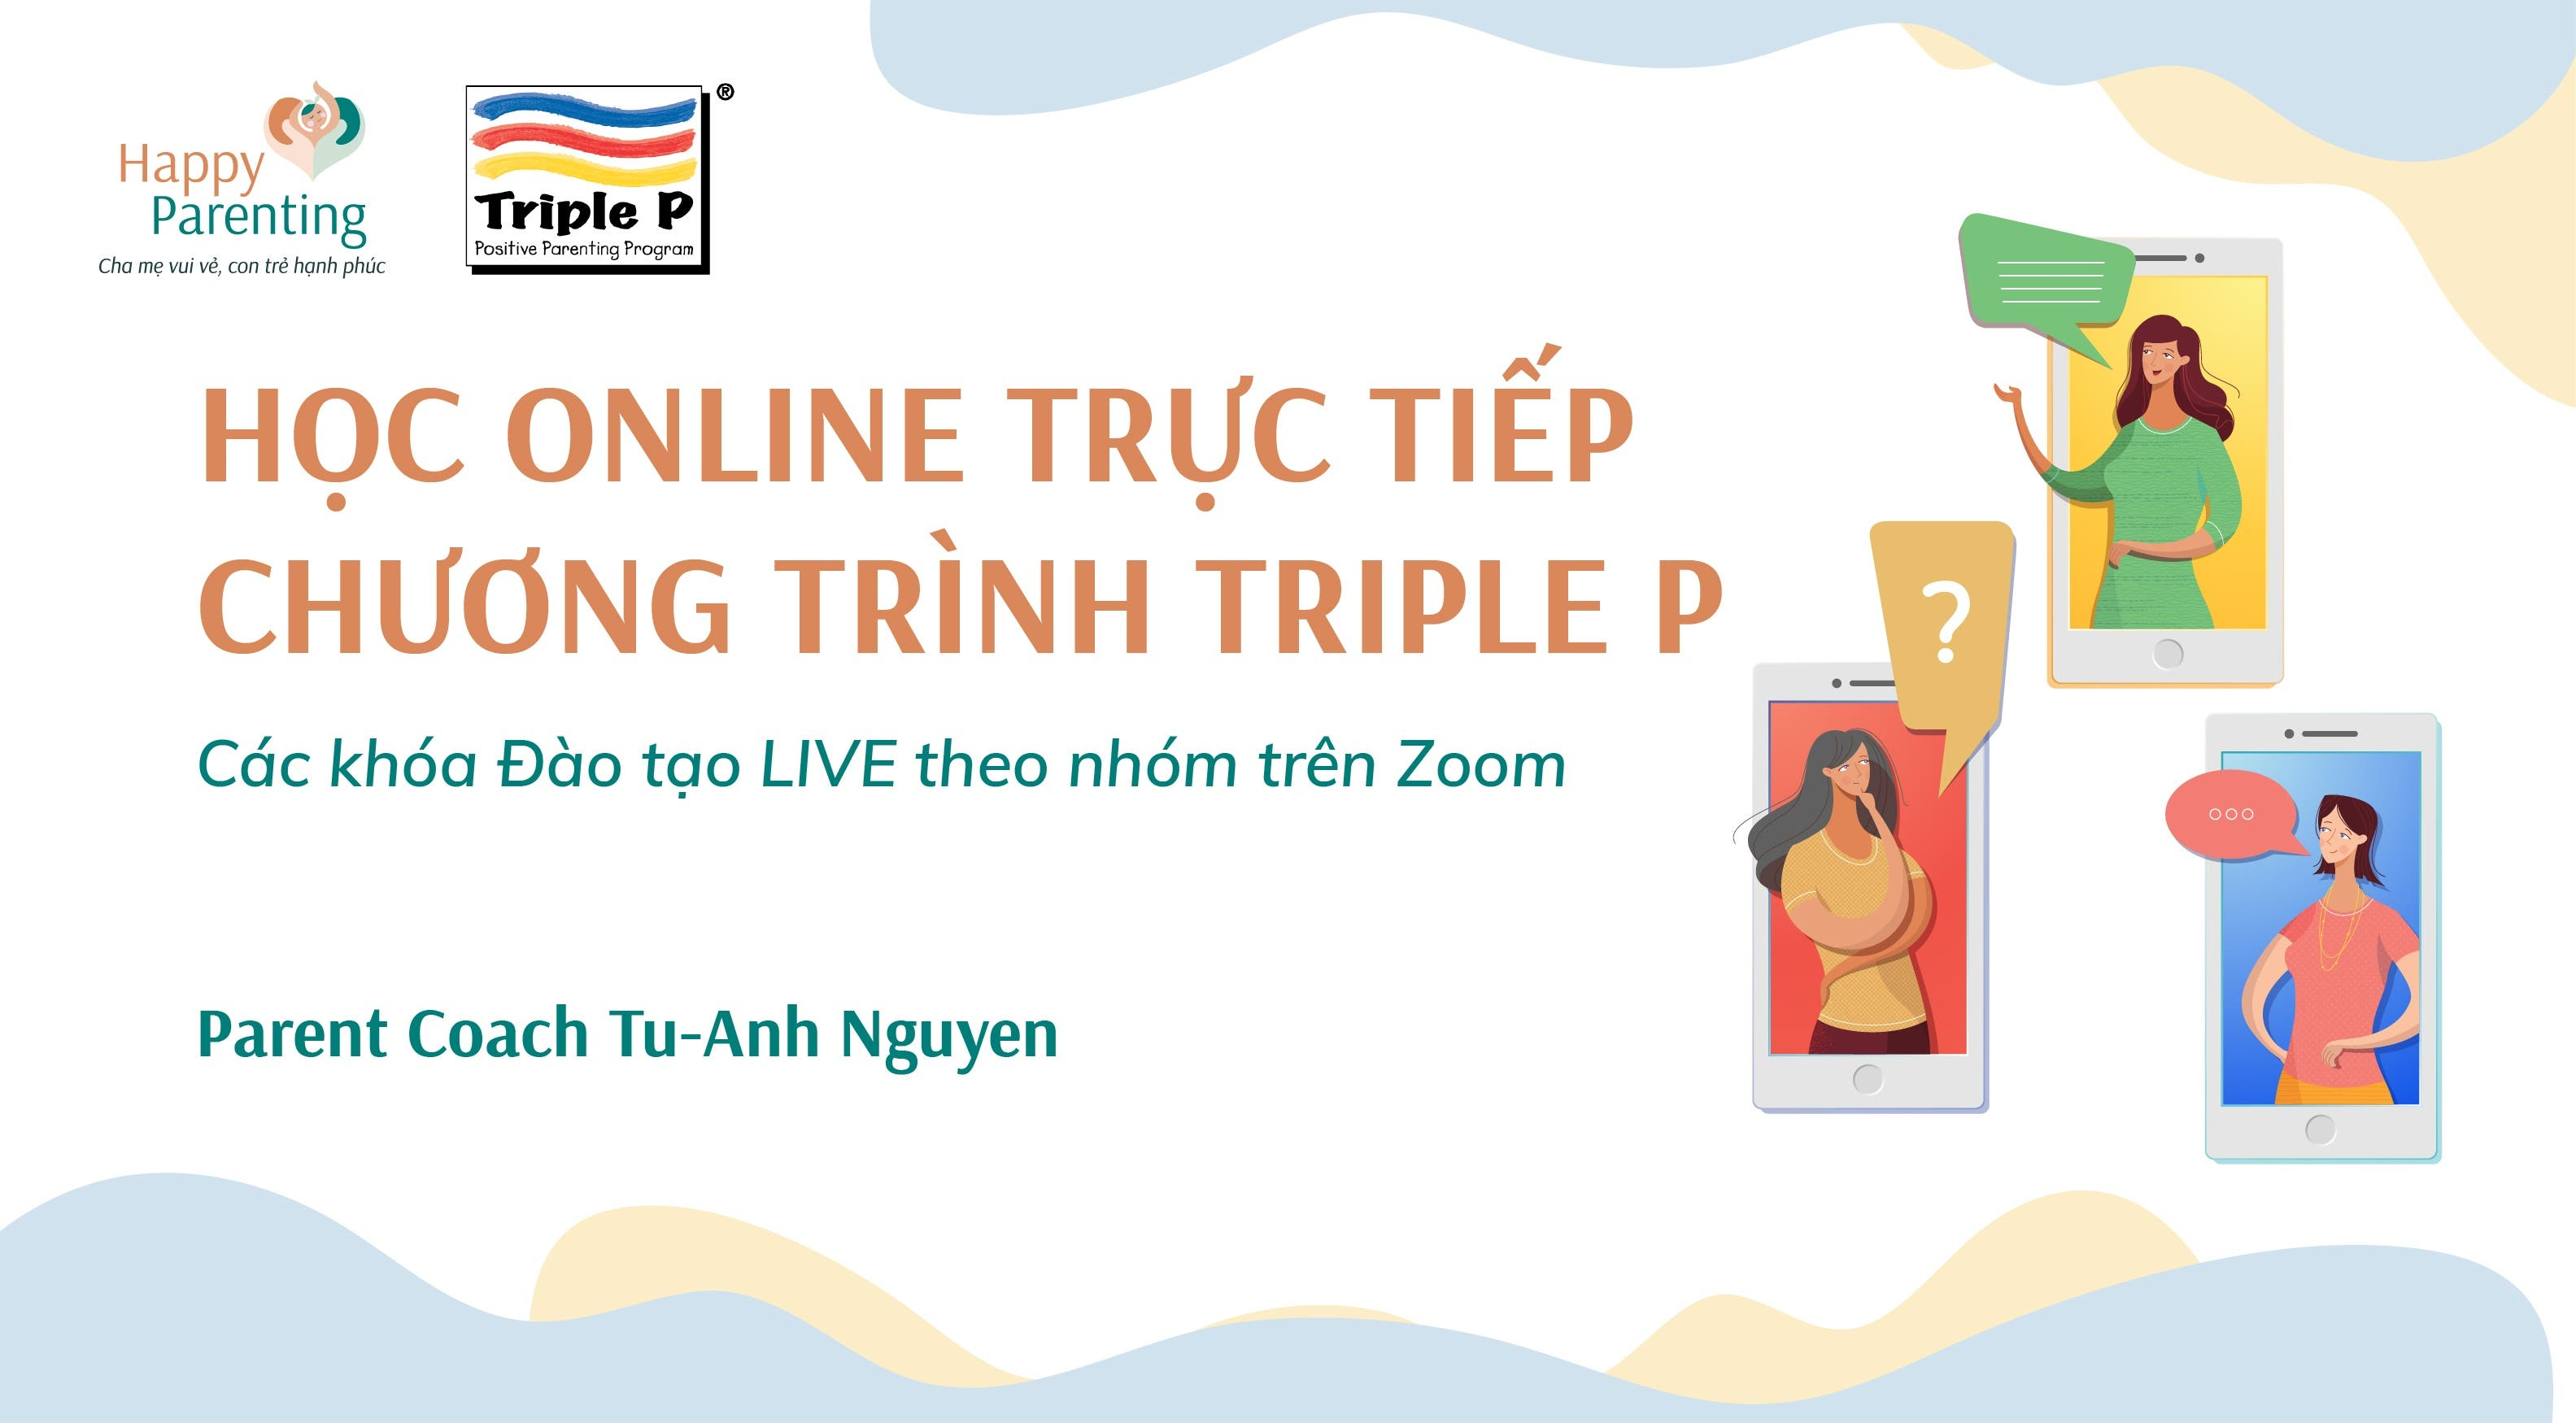 TRIPLE P - HỌC ONLINE TRỰC TIẾP